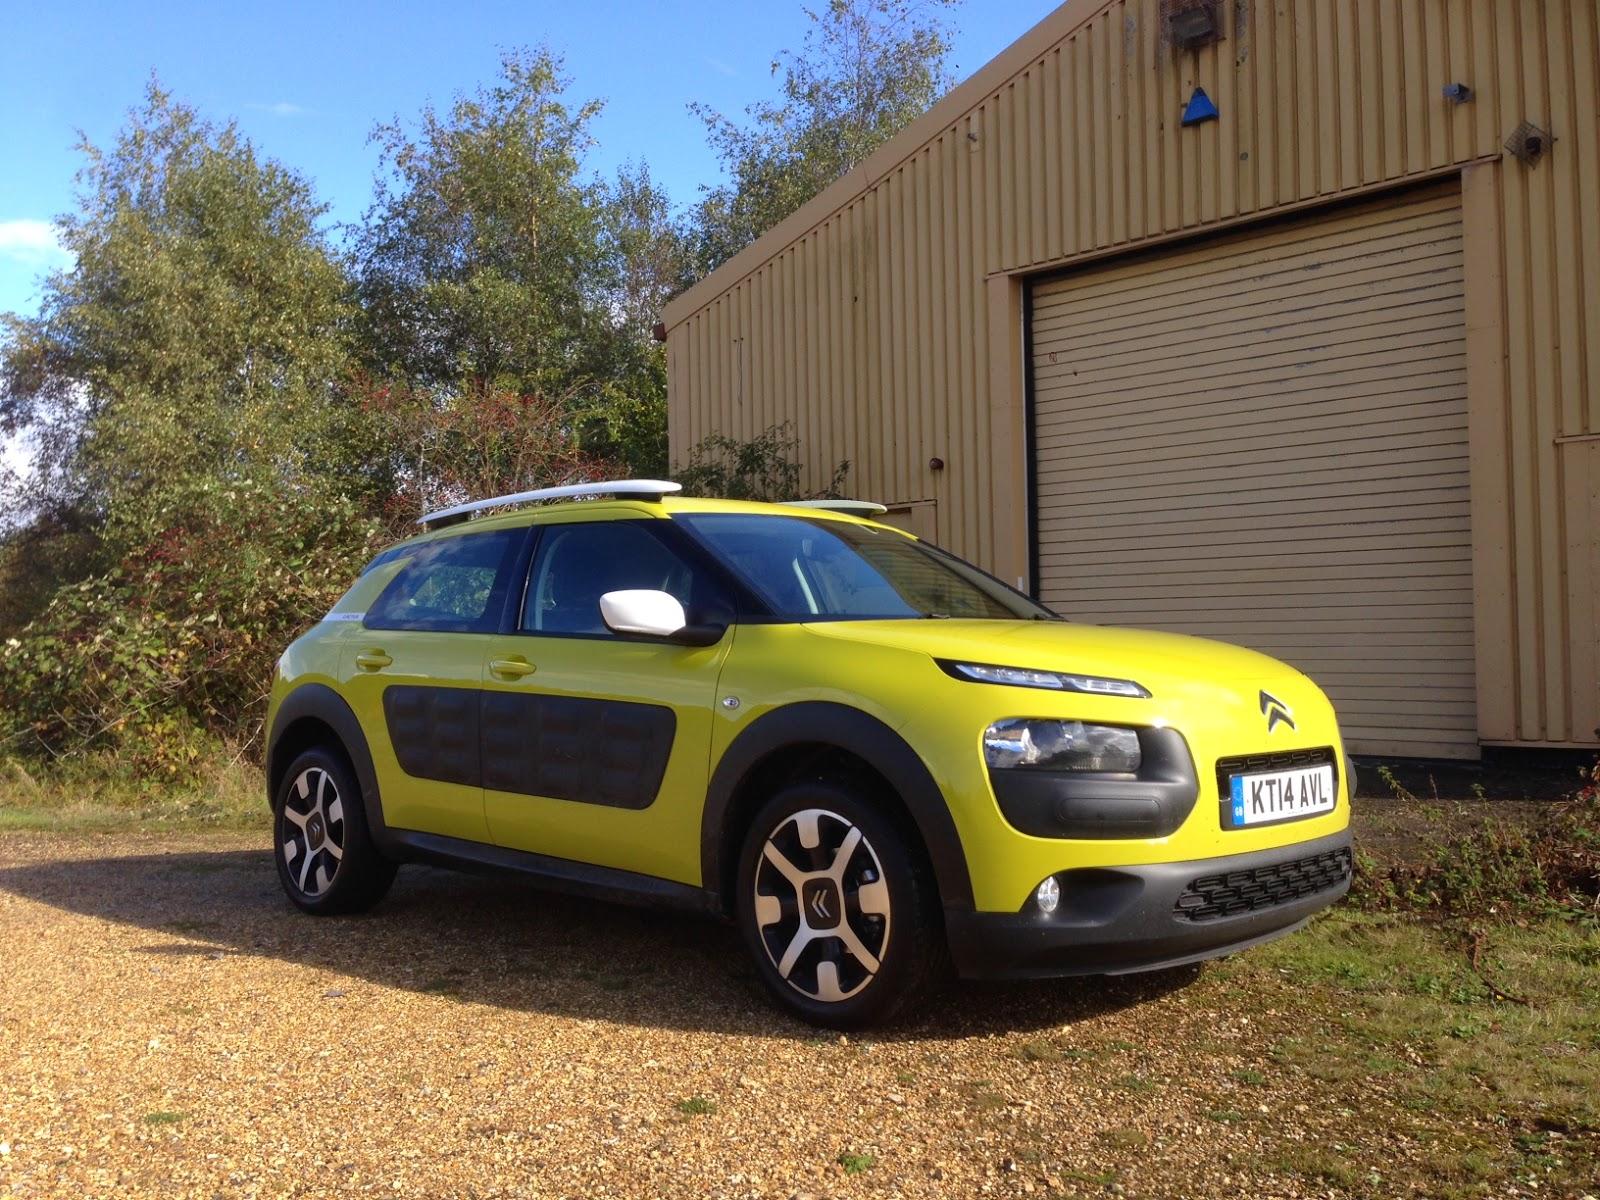 Citroën C4 Cactus in Hello Yellow